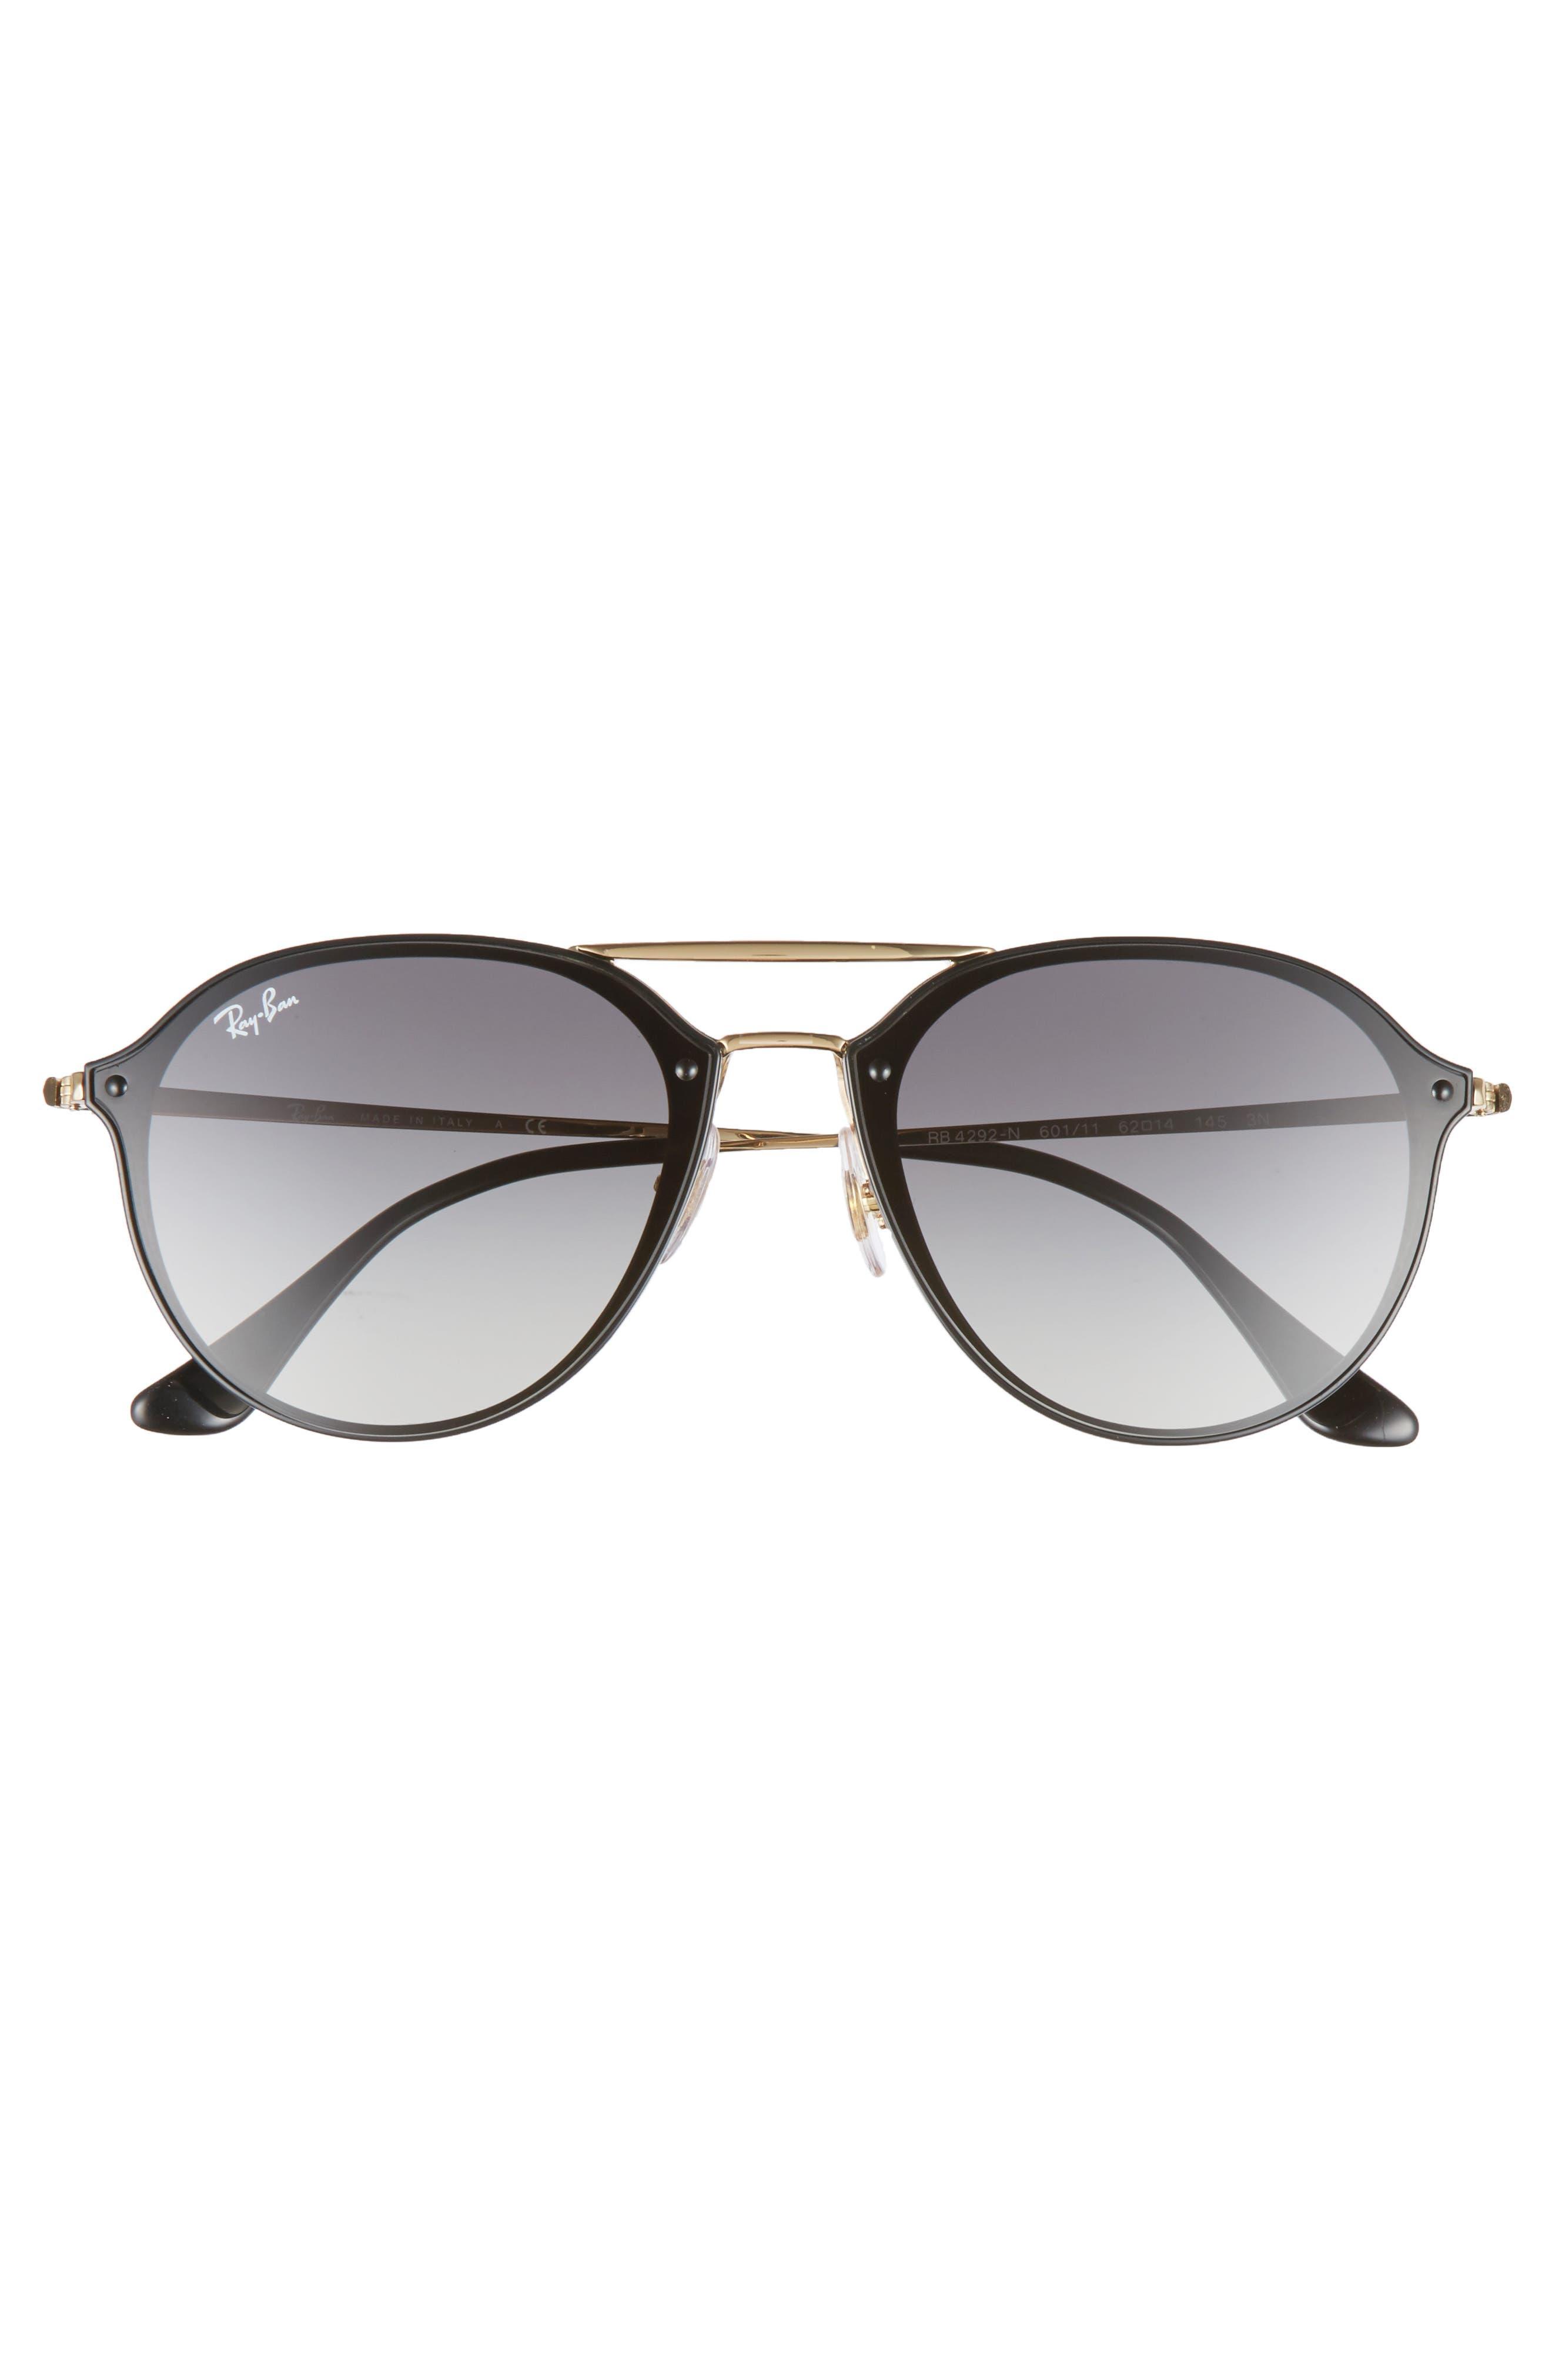 62mm Gradient Lens Aviator Sunglasses,                             Alternate thumbnail 4, color,                             BLACK